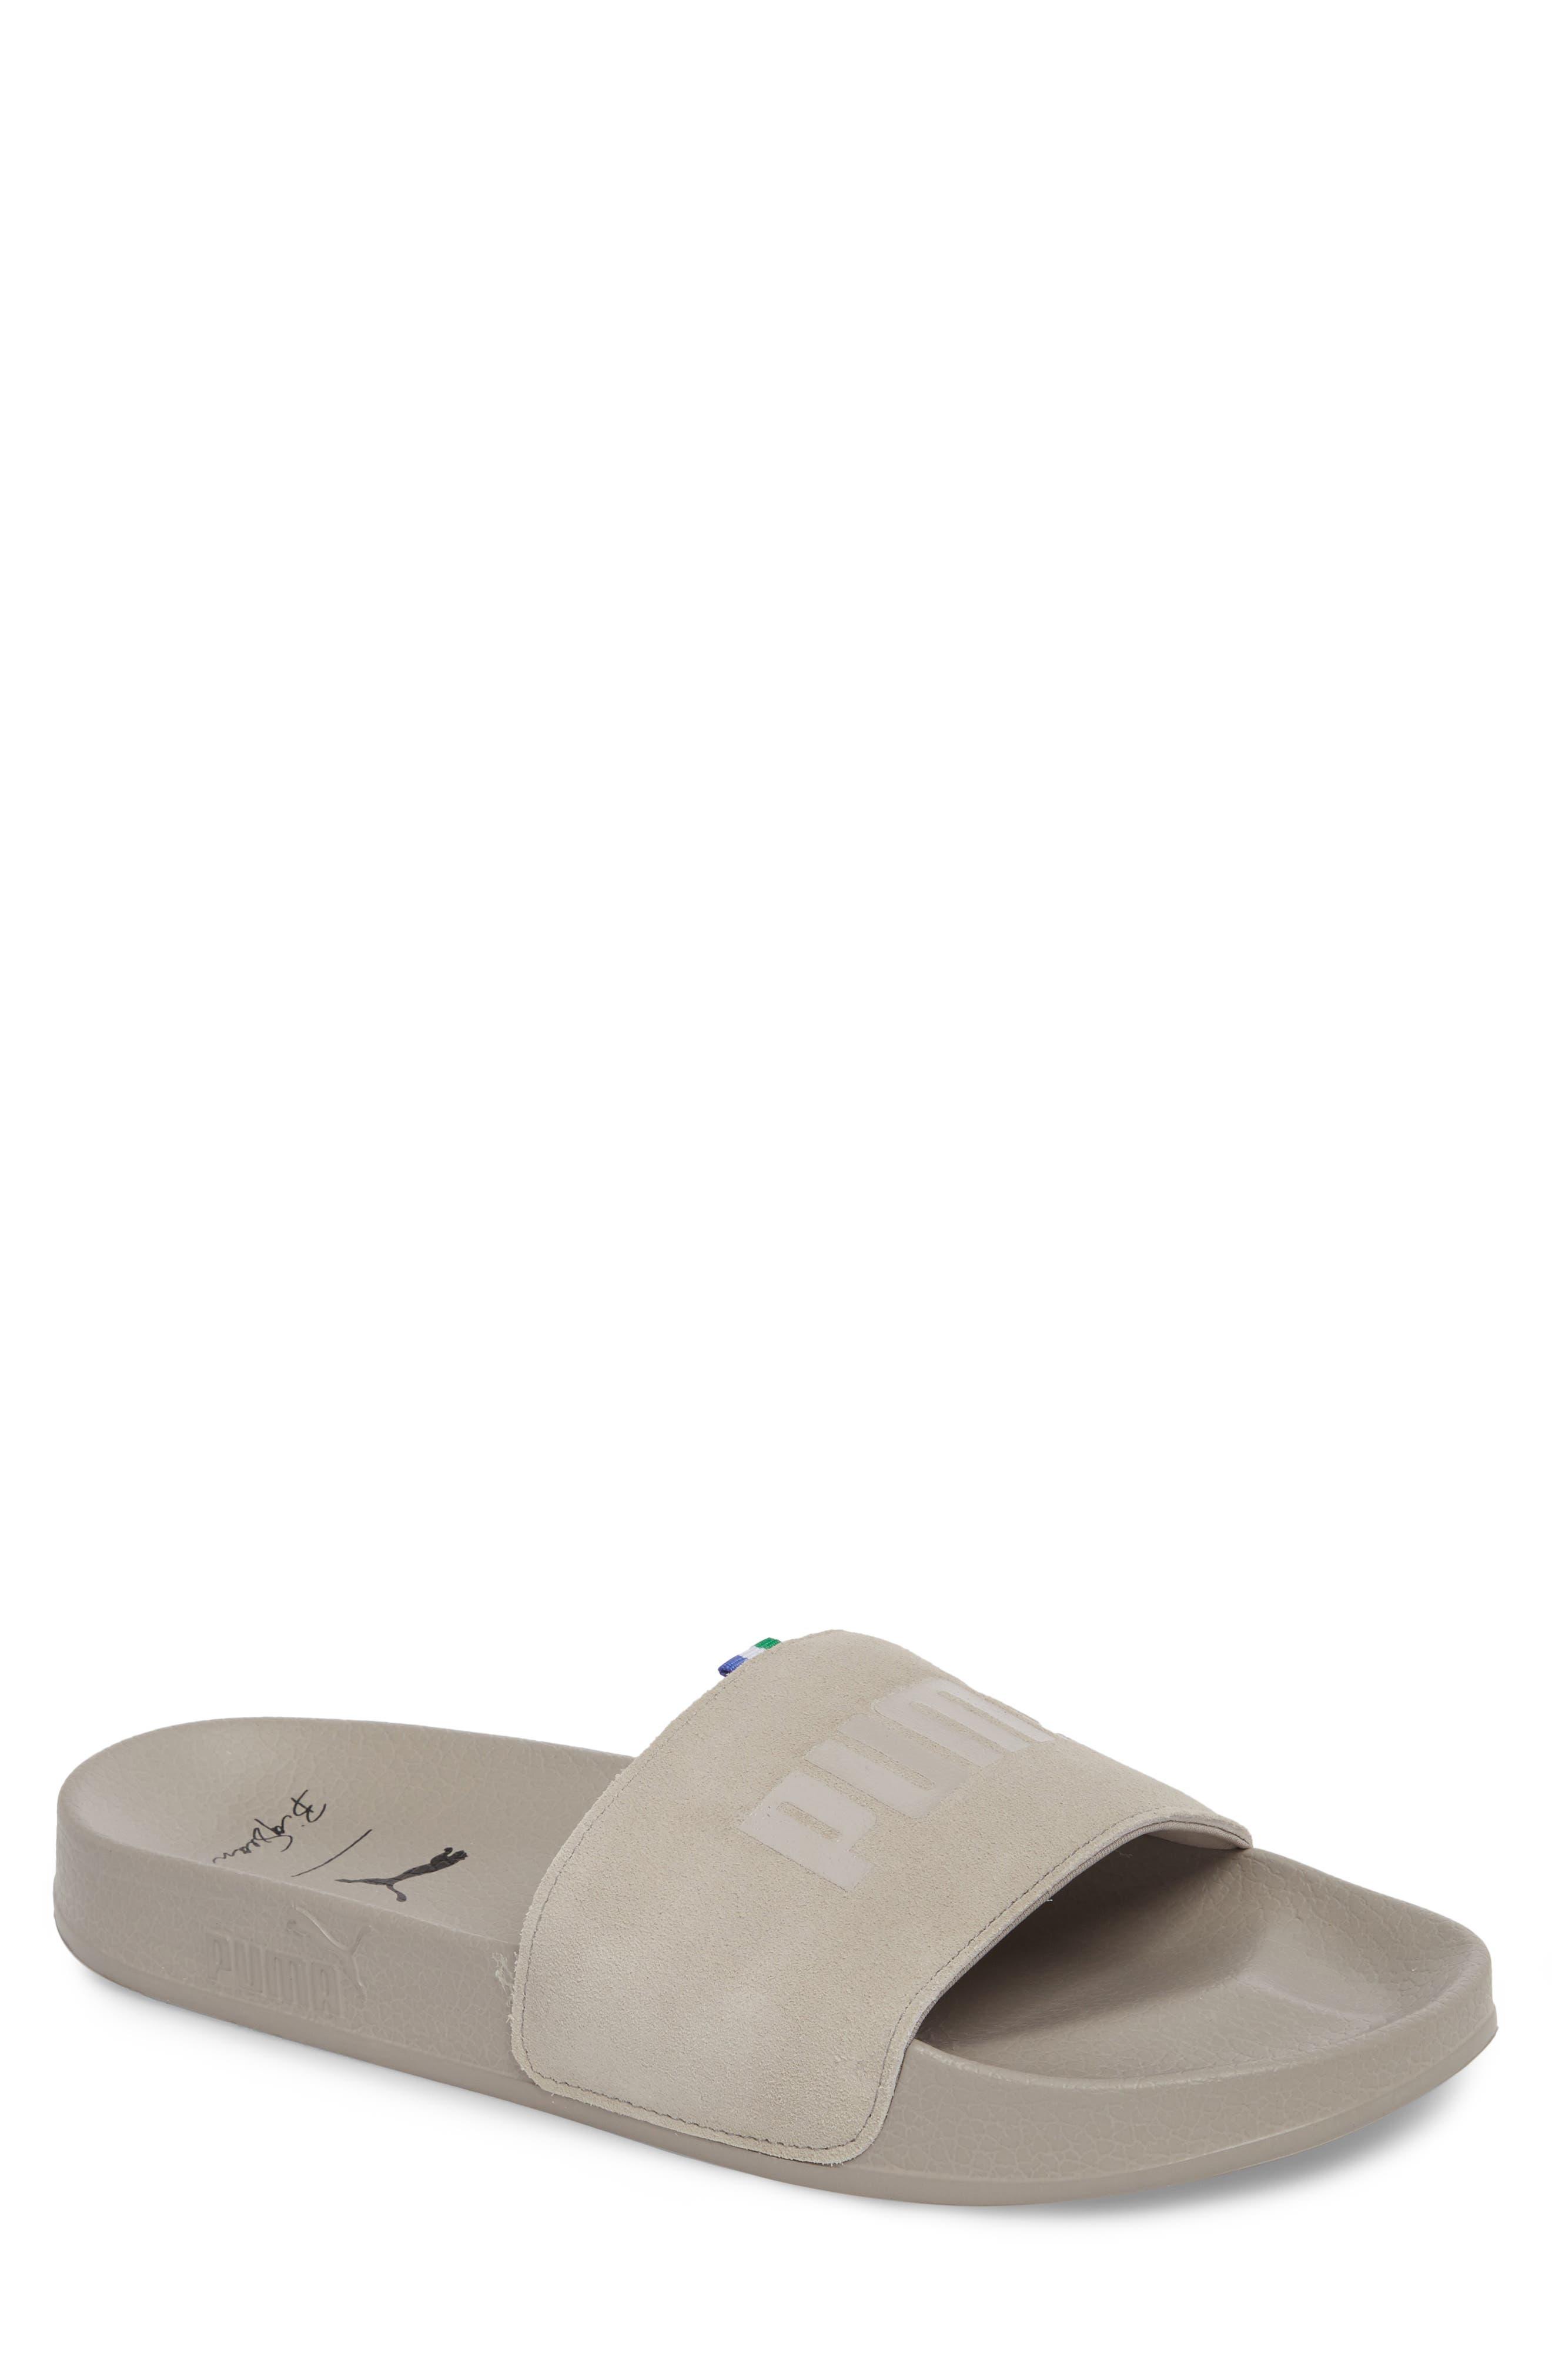 x Big Sean Leadcat Slide Sandal,                         Main,                         color, 060